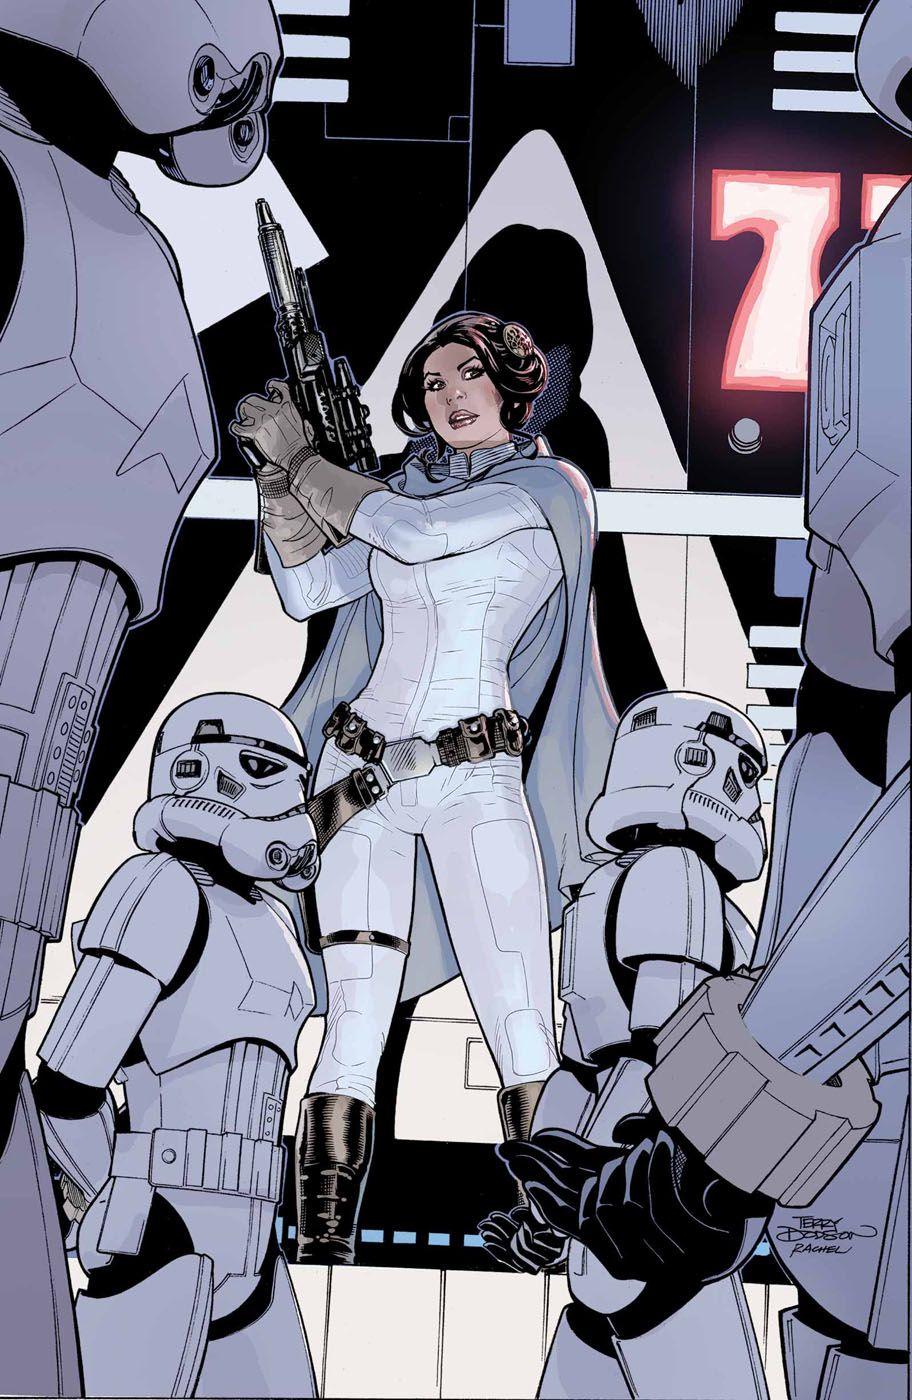 Jabba The Hutt Fucks Princess Leia Minimalist star wars conversion for mutants & masterminds 3ekane